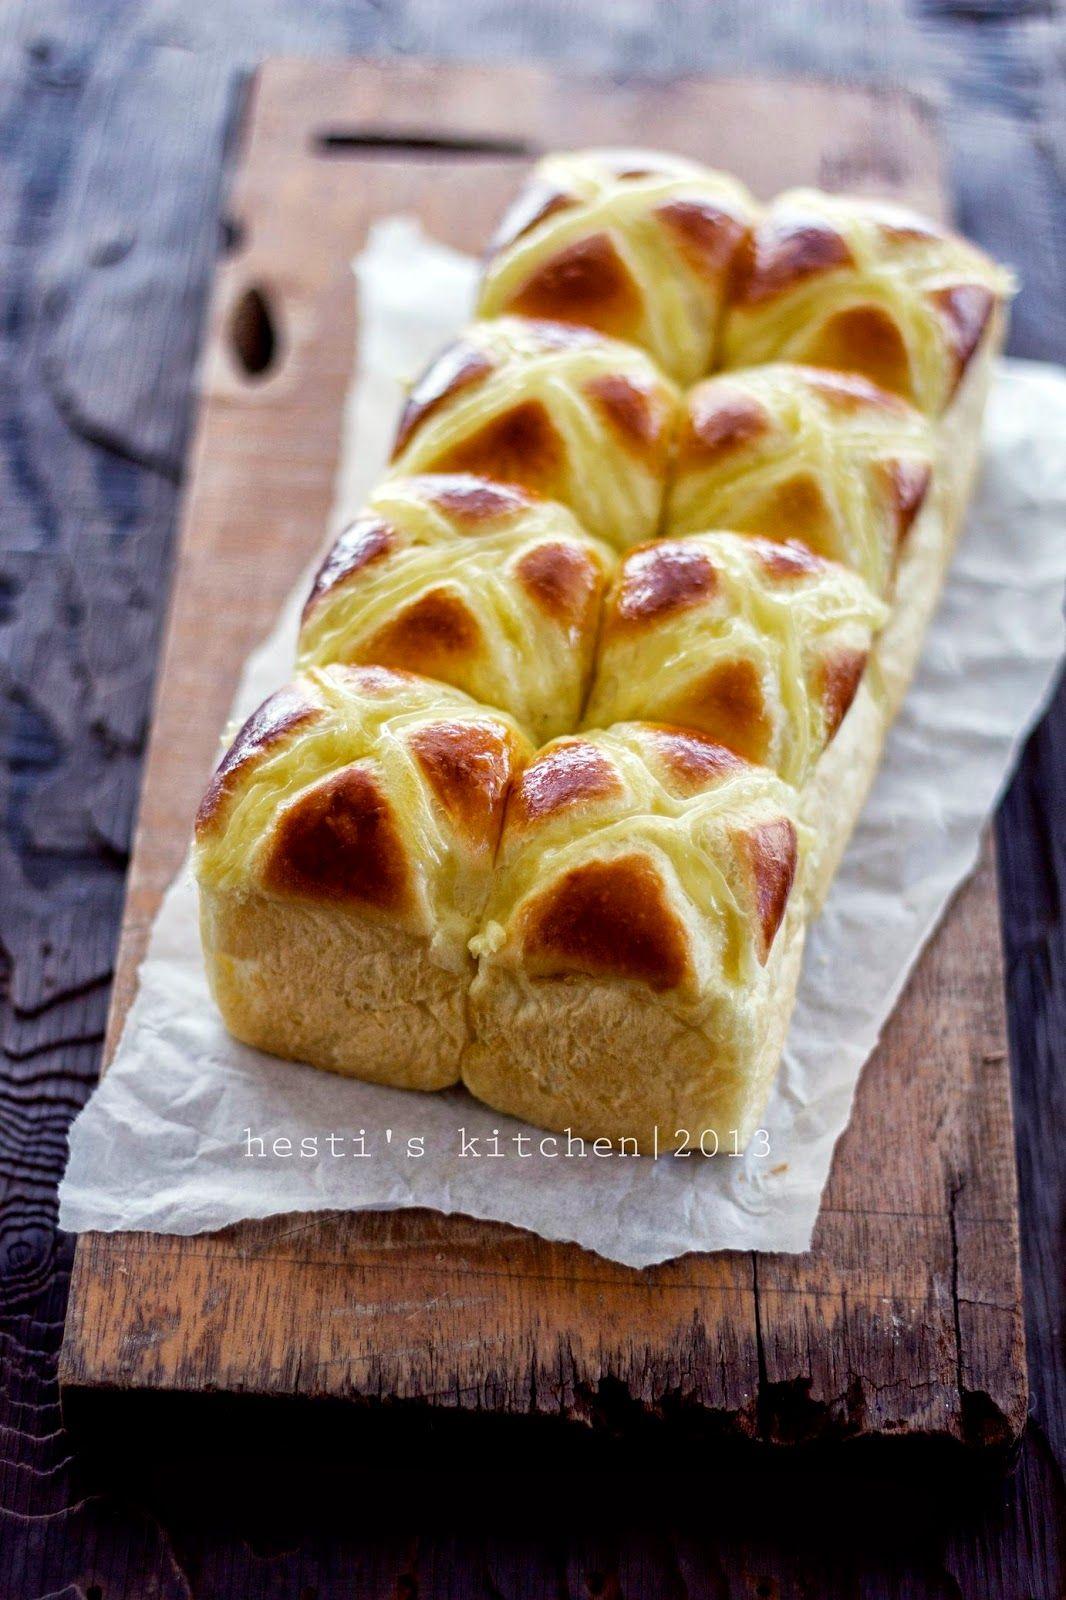 Hesti S Kitchen Yummy For Your Tummy Roti Kentang Potato Buns Rotis Makanan Dan Minuman Kentang